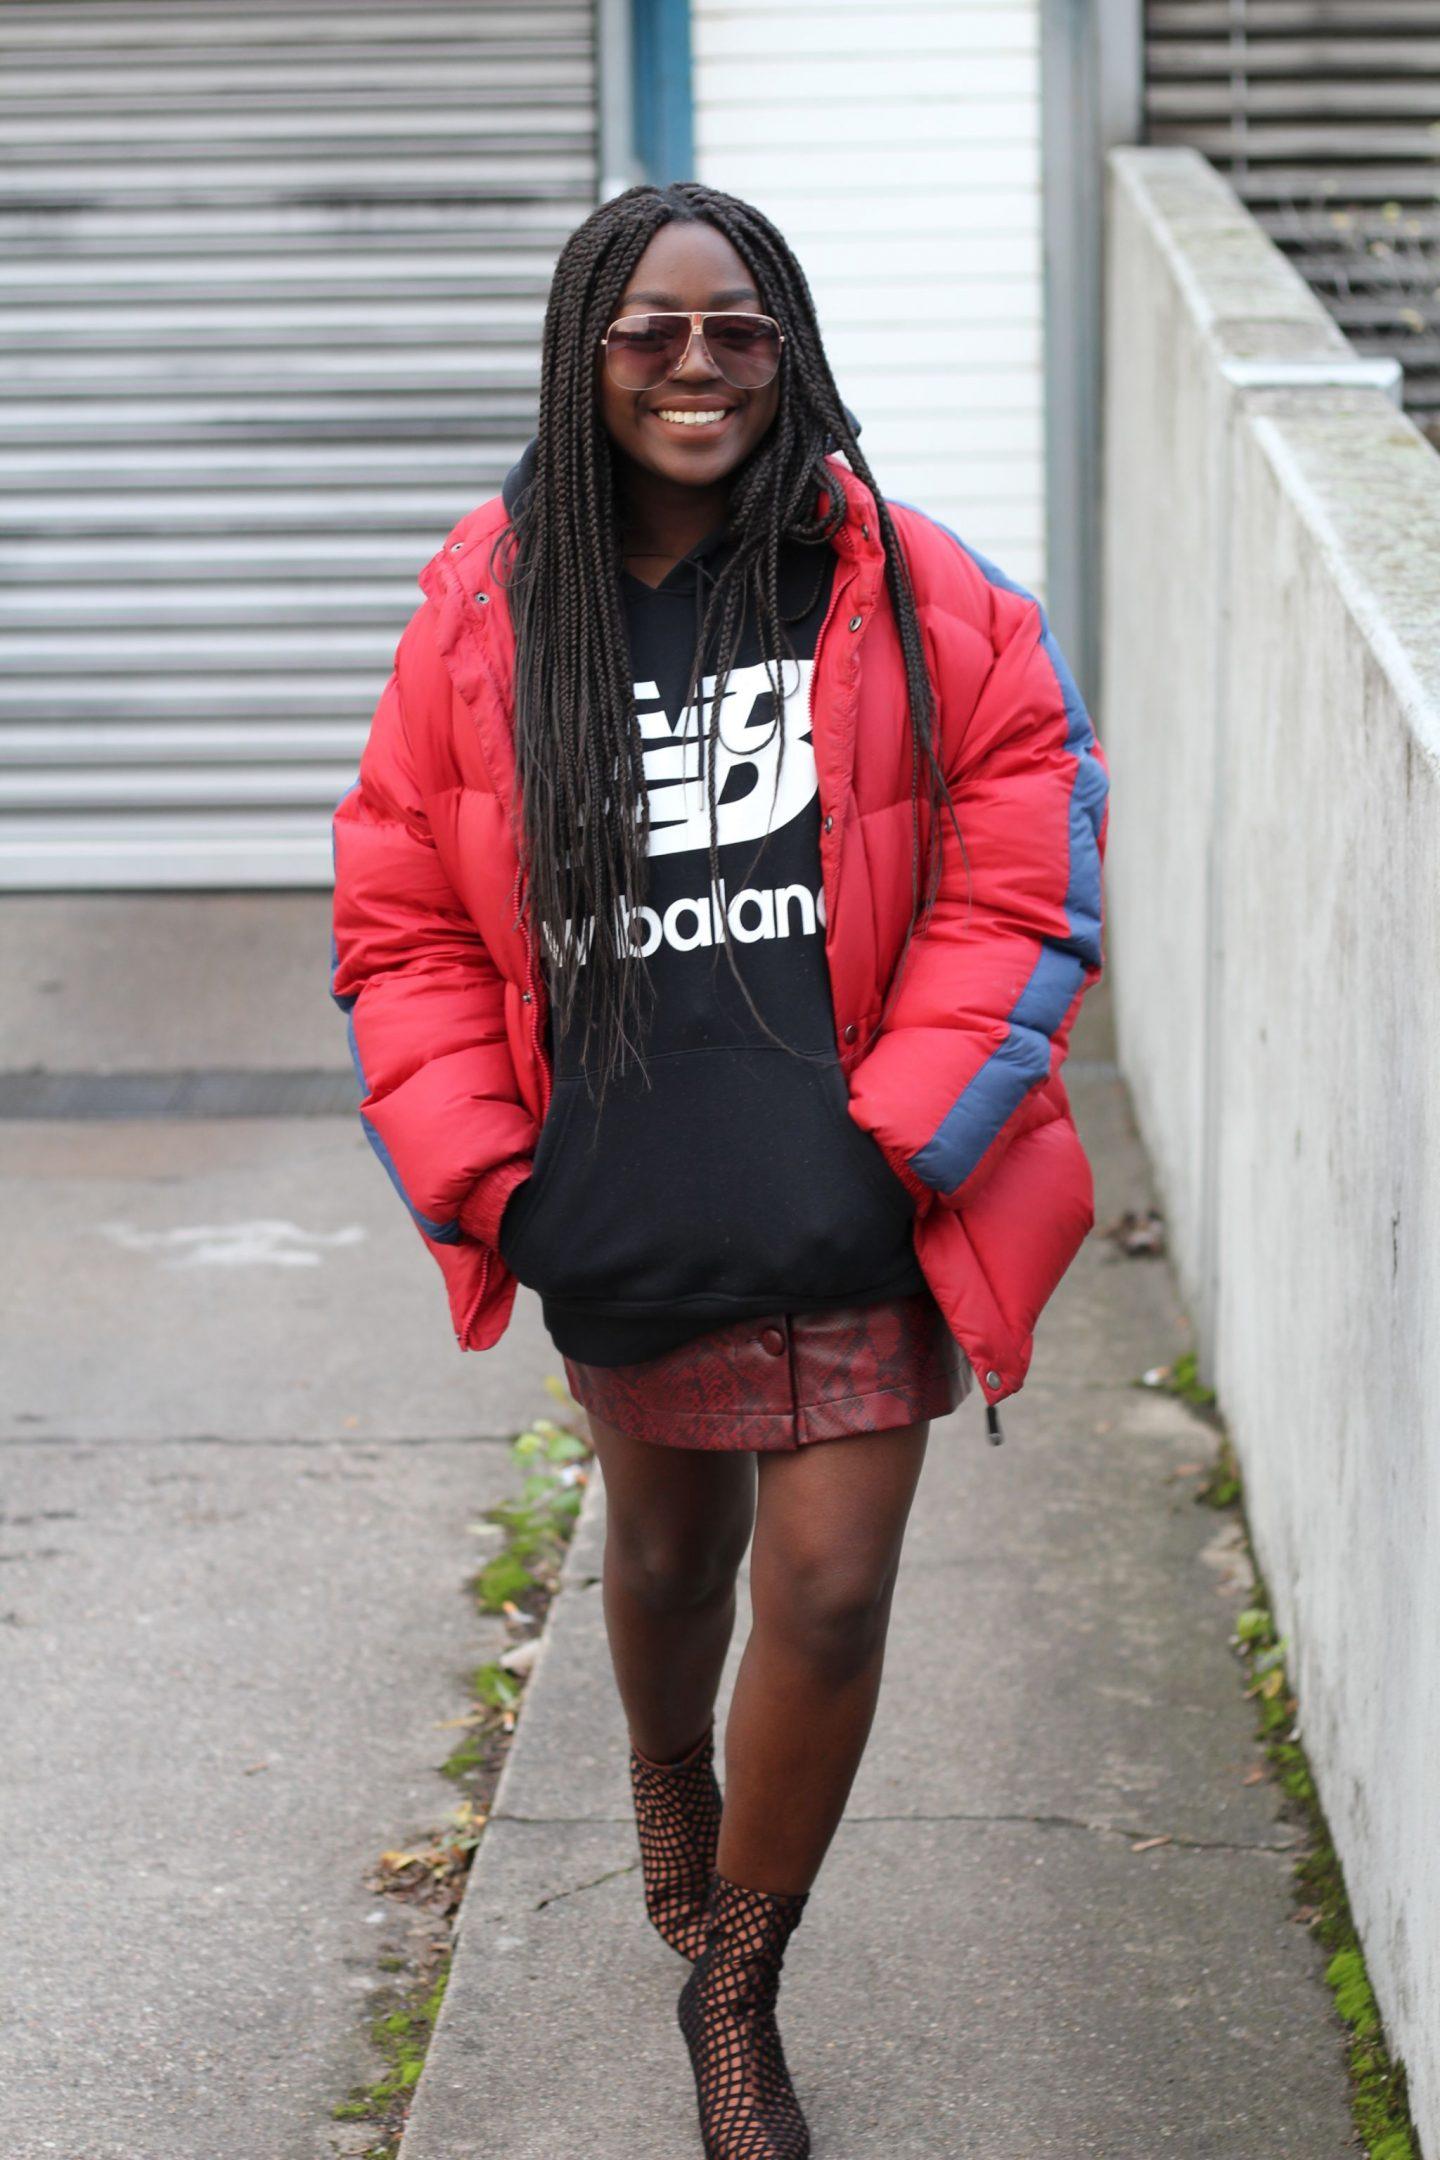 streetwear_chic_lois_opoku_fashion_blog_style_berlin_lisforlois_1